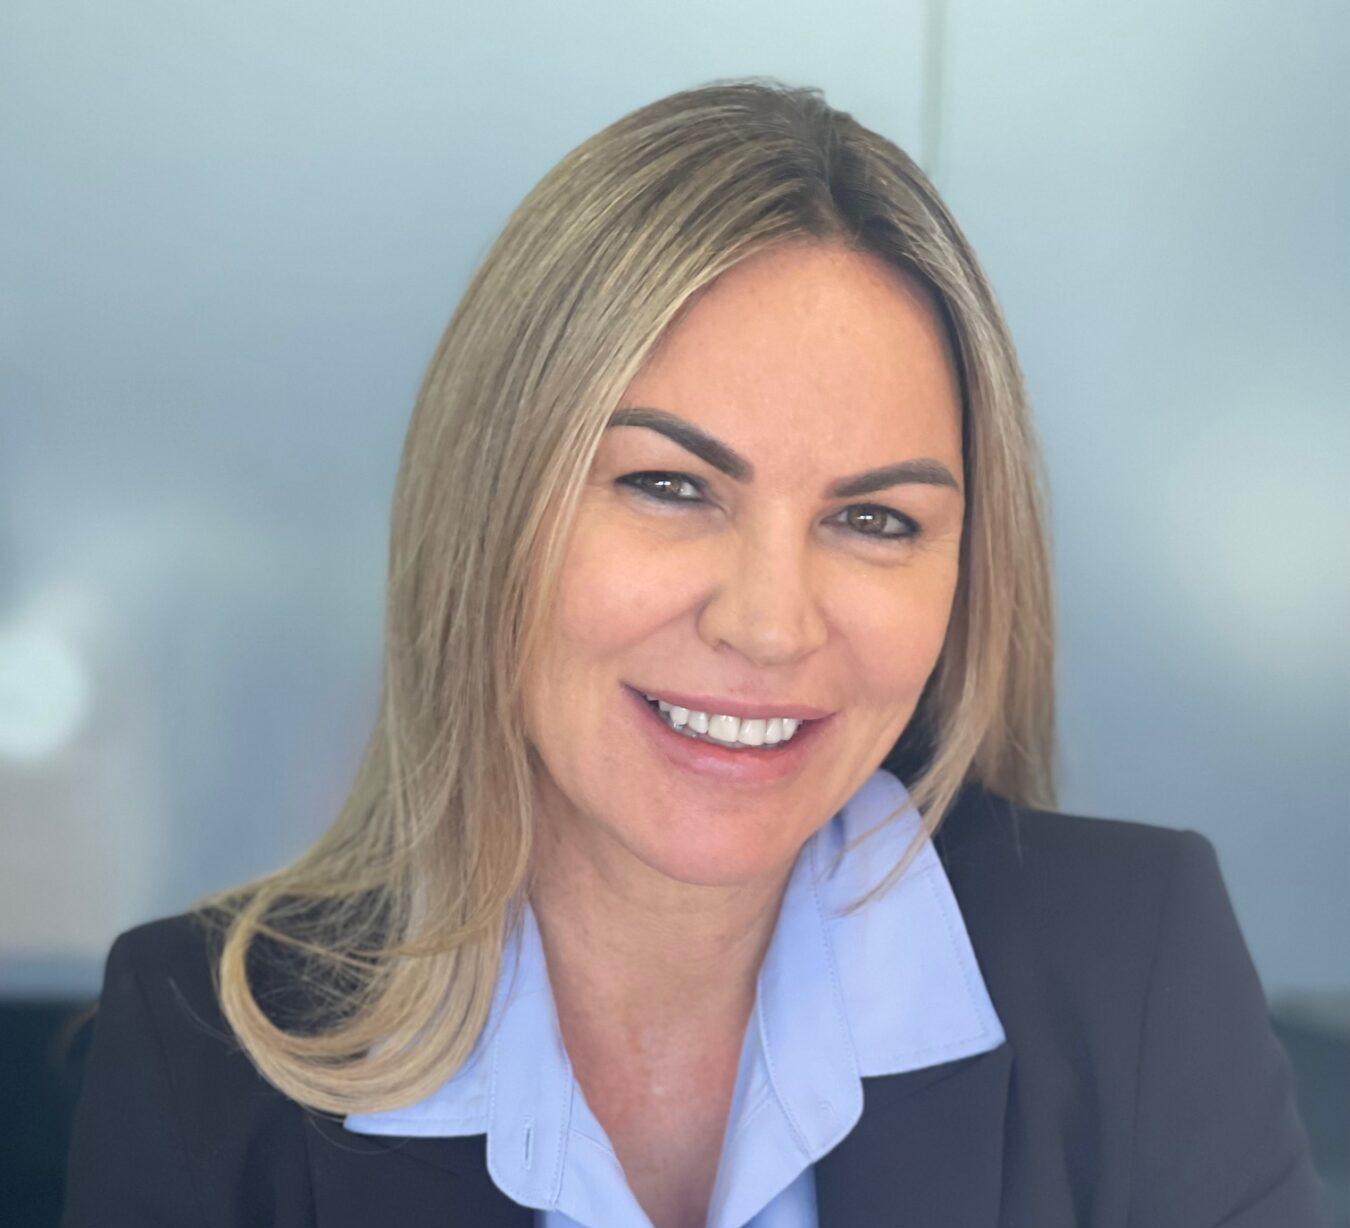 Juanita Wrenn